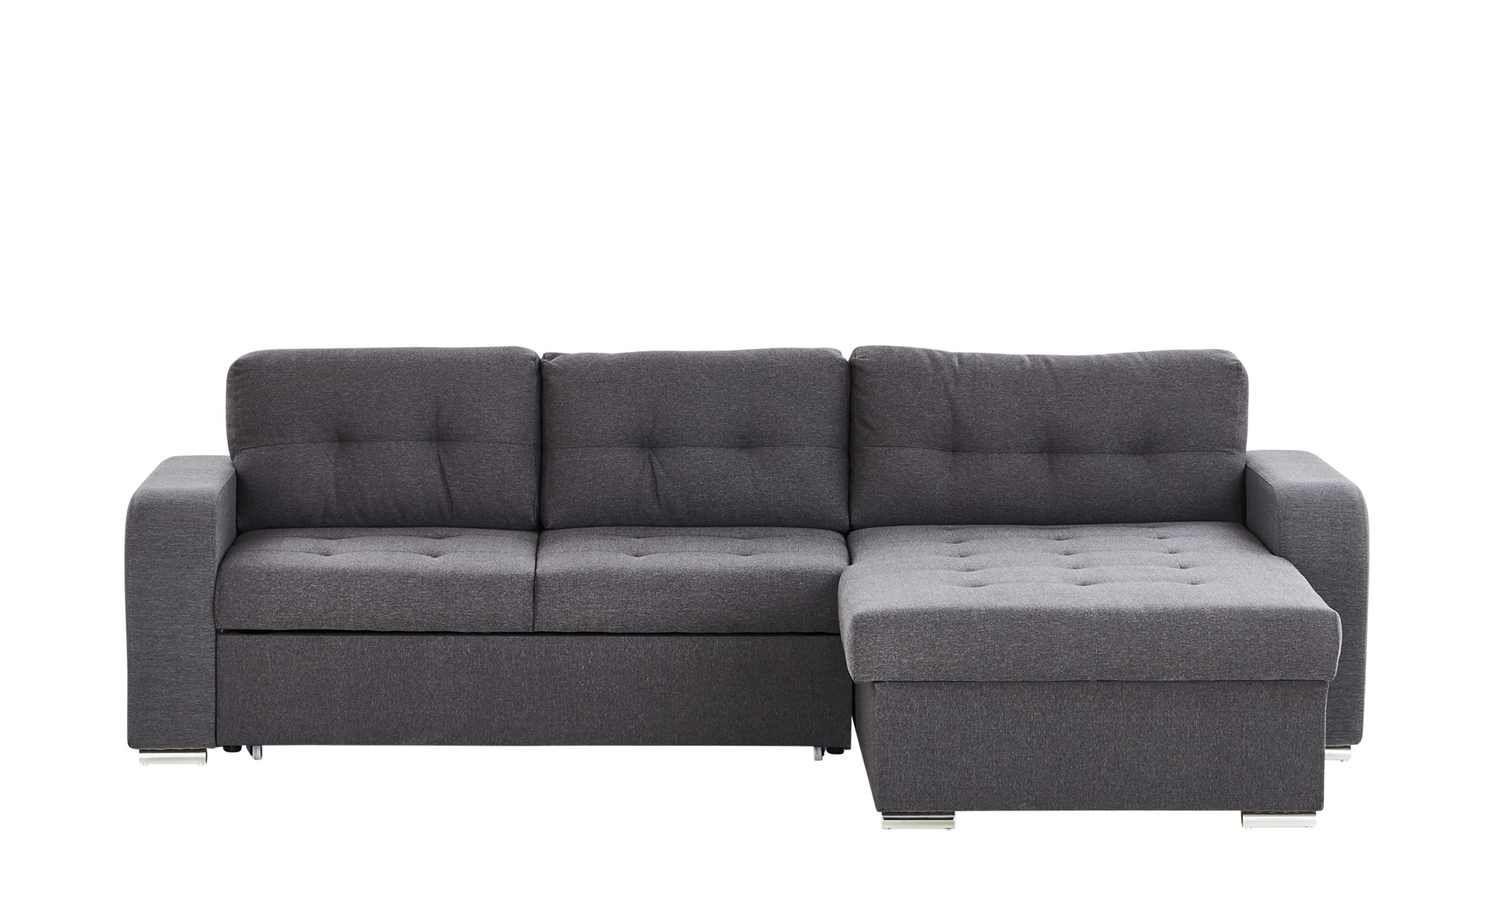 Ecksofa Carmen Gefunden Bei Mobel Hoffner Sofa Couch Furniture